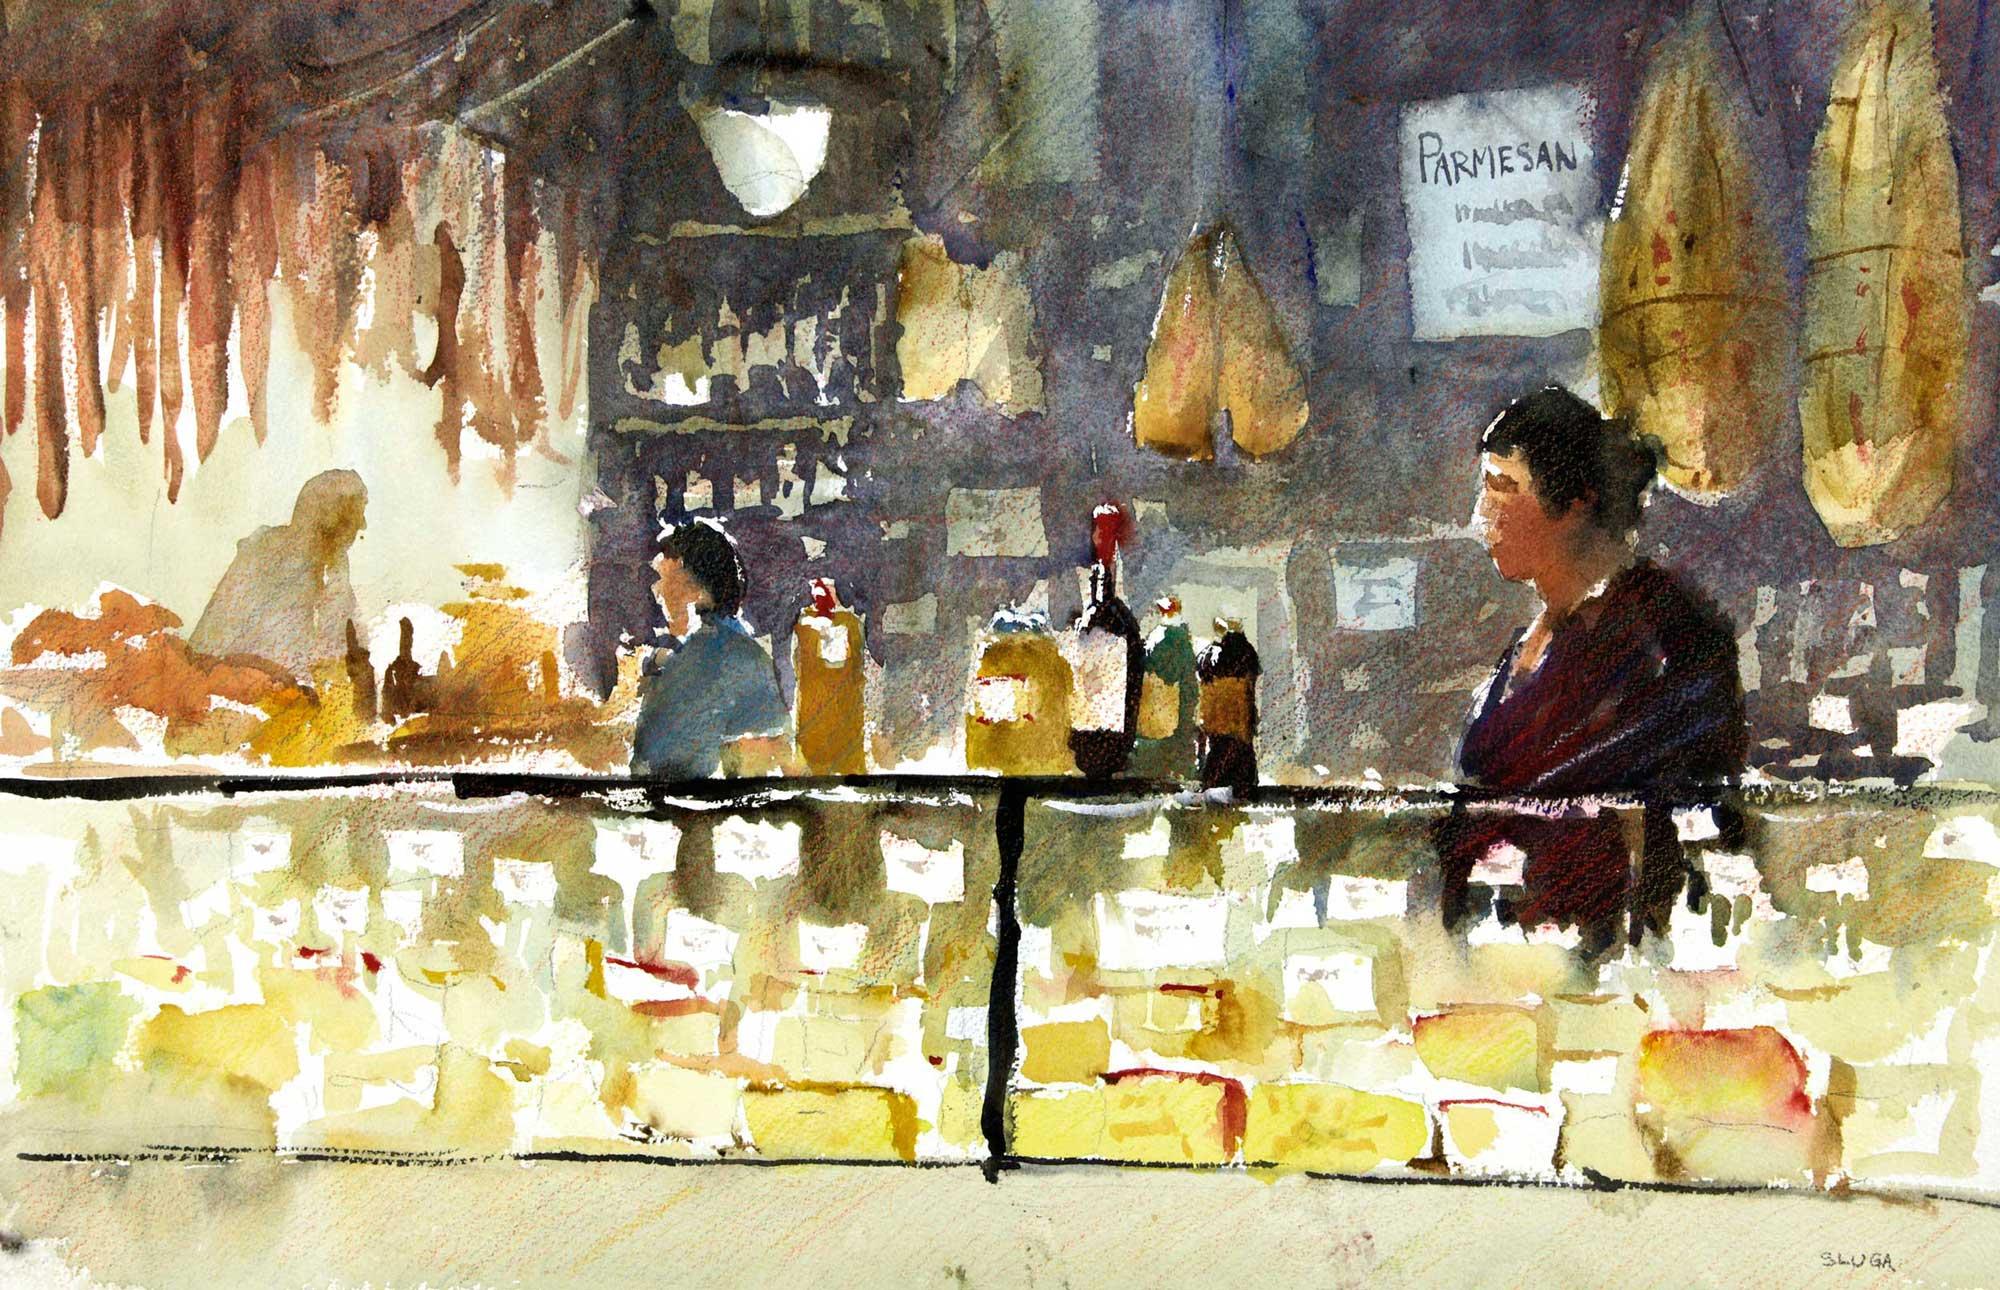 Cheese, Victoria Market 55 x 35 cm